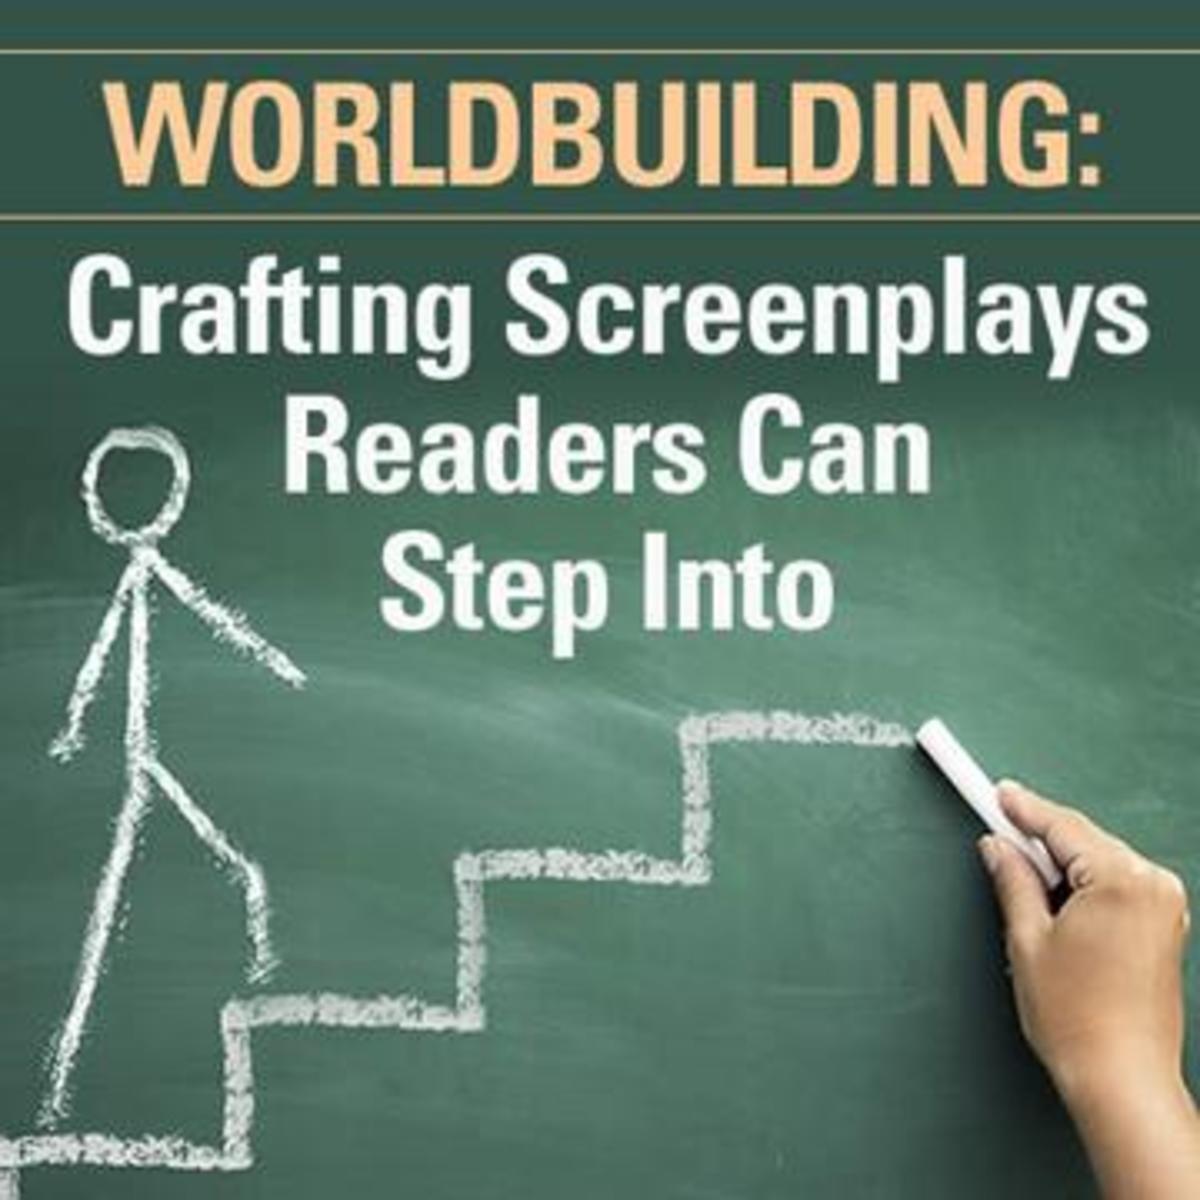 worldbuilding-step-500_360x